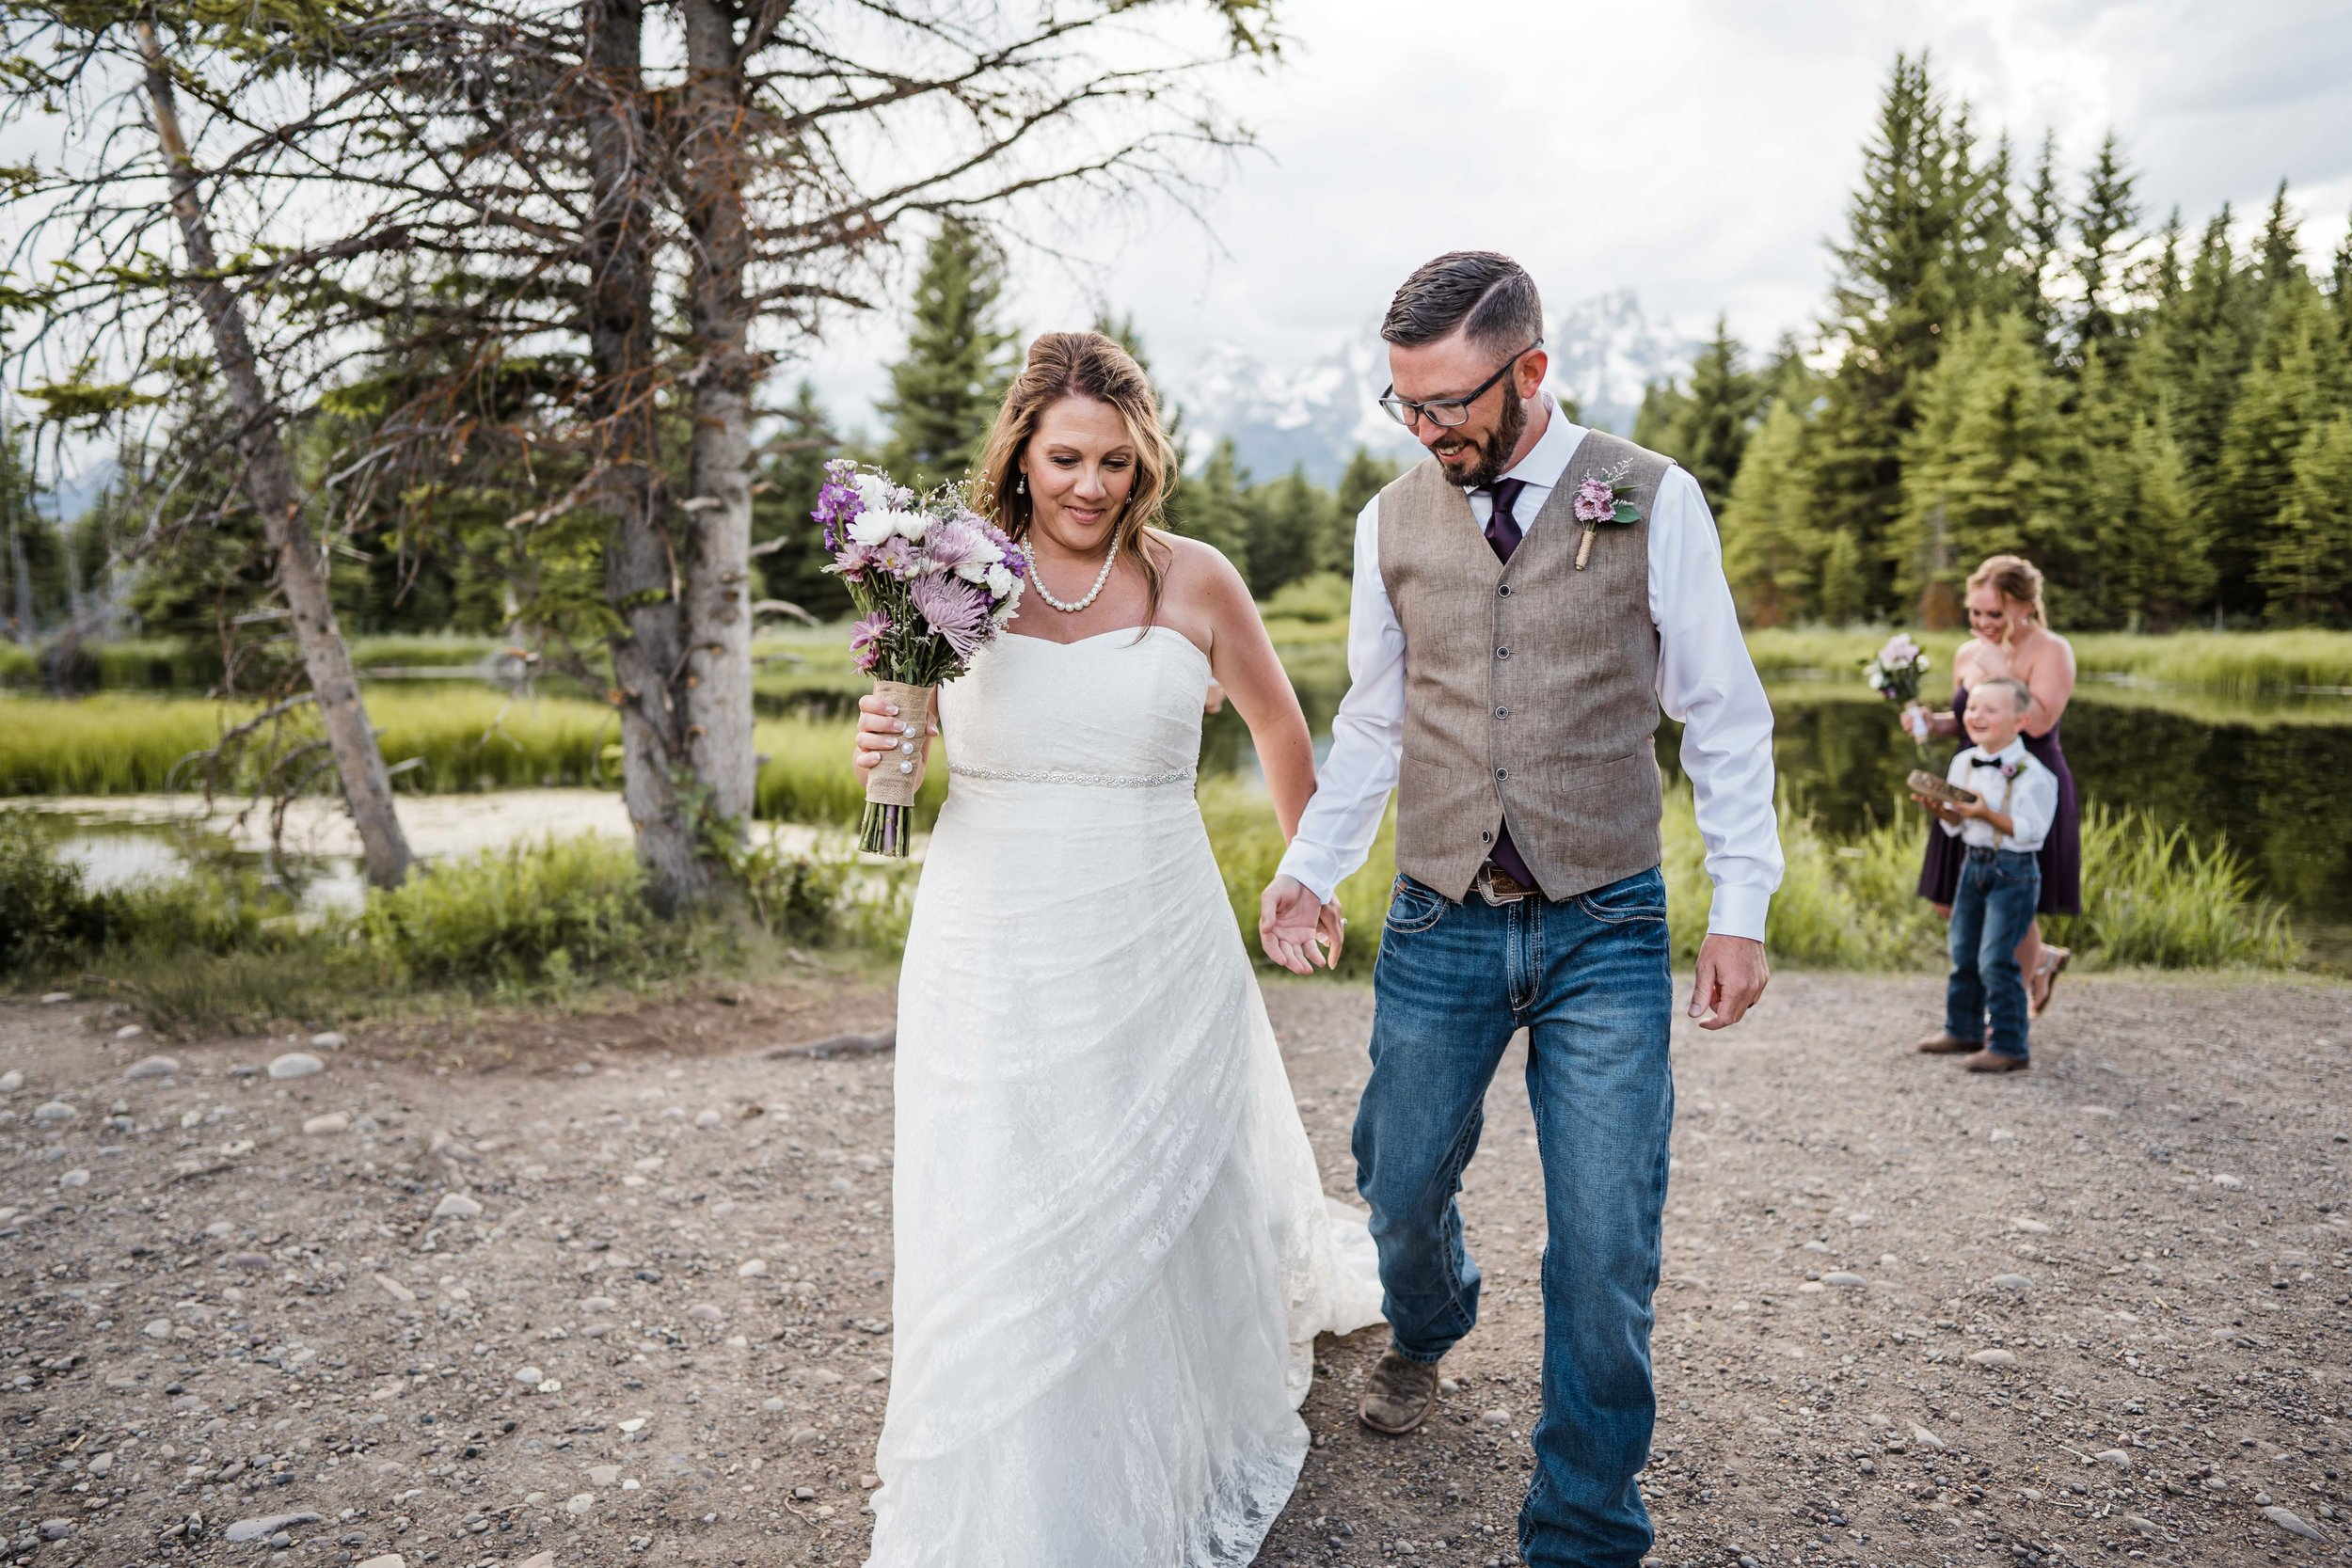 jackson hole adventure wedding photography at schwabachers landing in GTNP -DSD01648.jpg